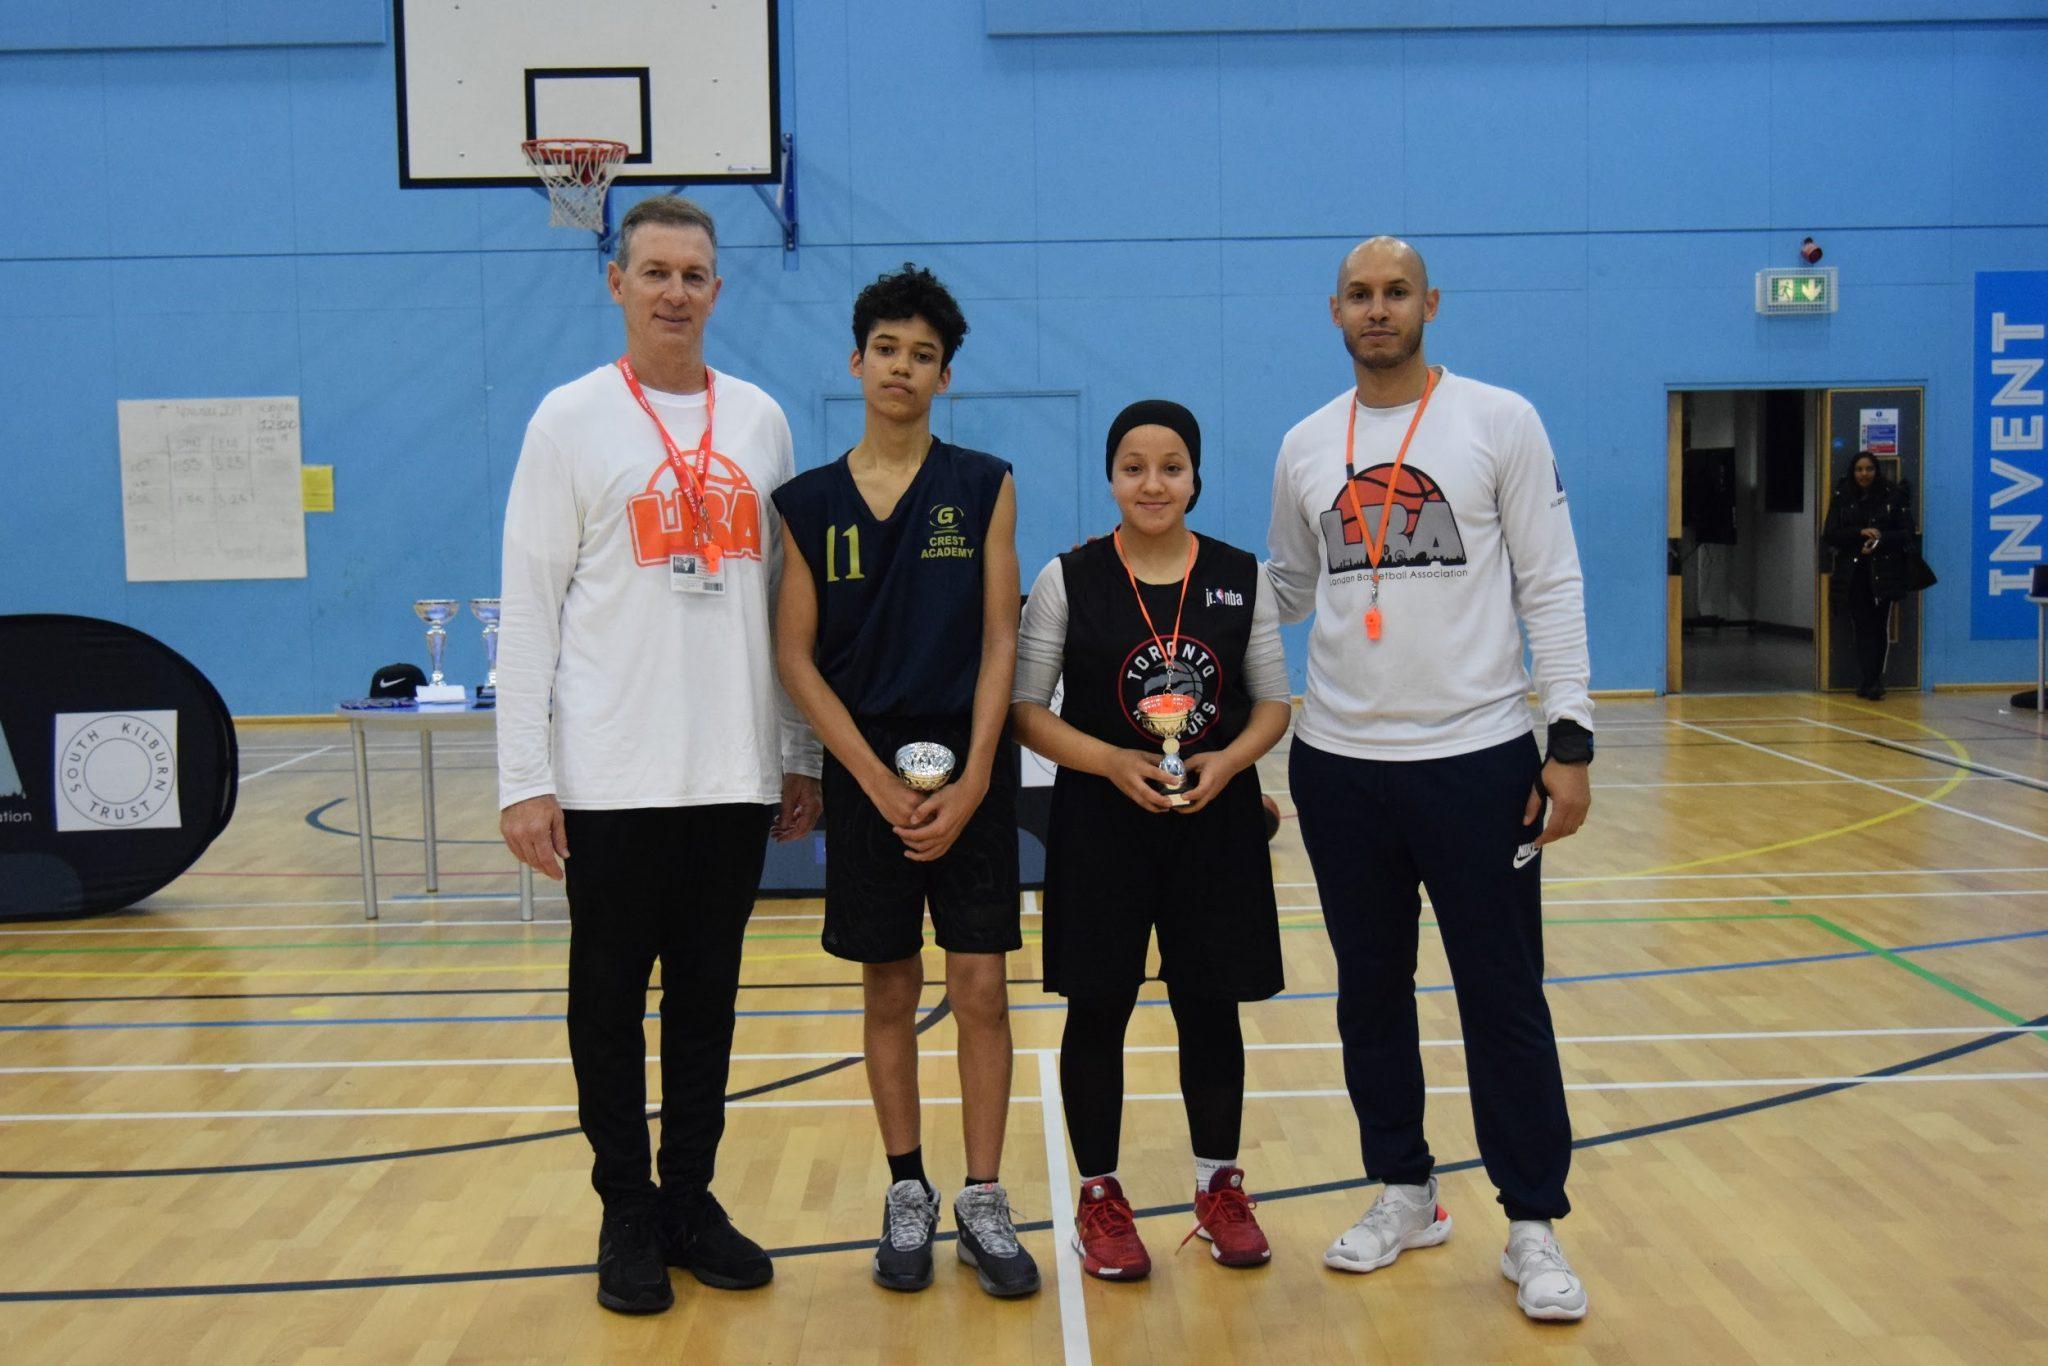 Brent U14 Girls MVP: Nazha Kasim from Crest Academy; Brent U14 Boys MVP: Malachi Stephens from Crest Academy